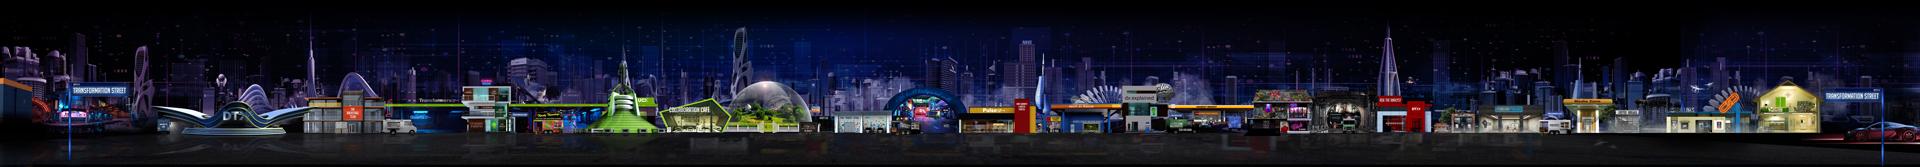 Transformation street dtx 2021